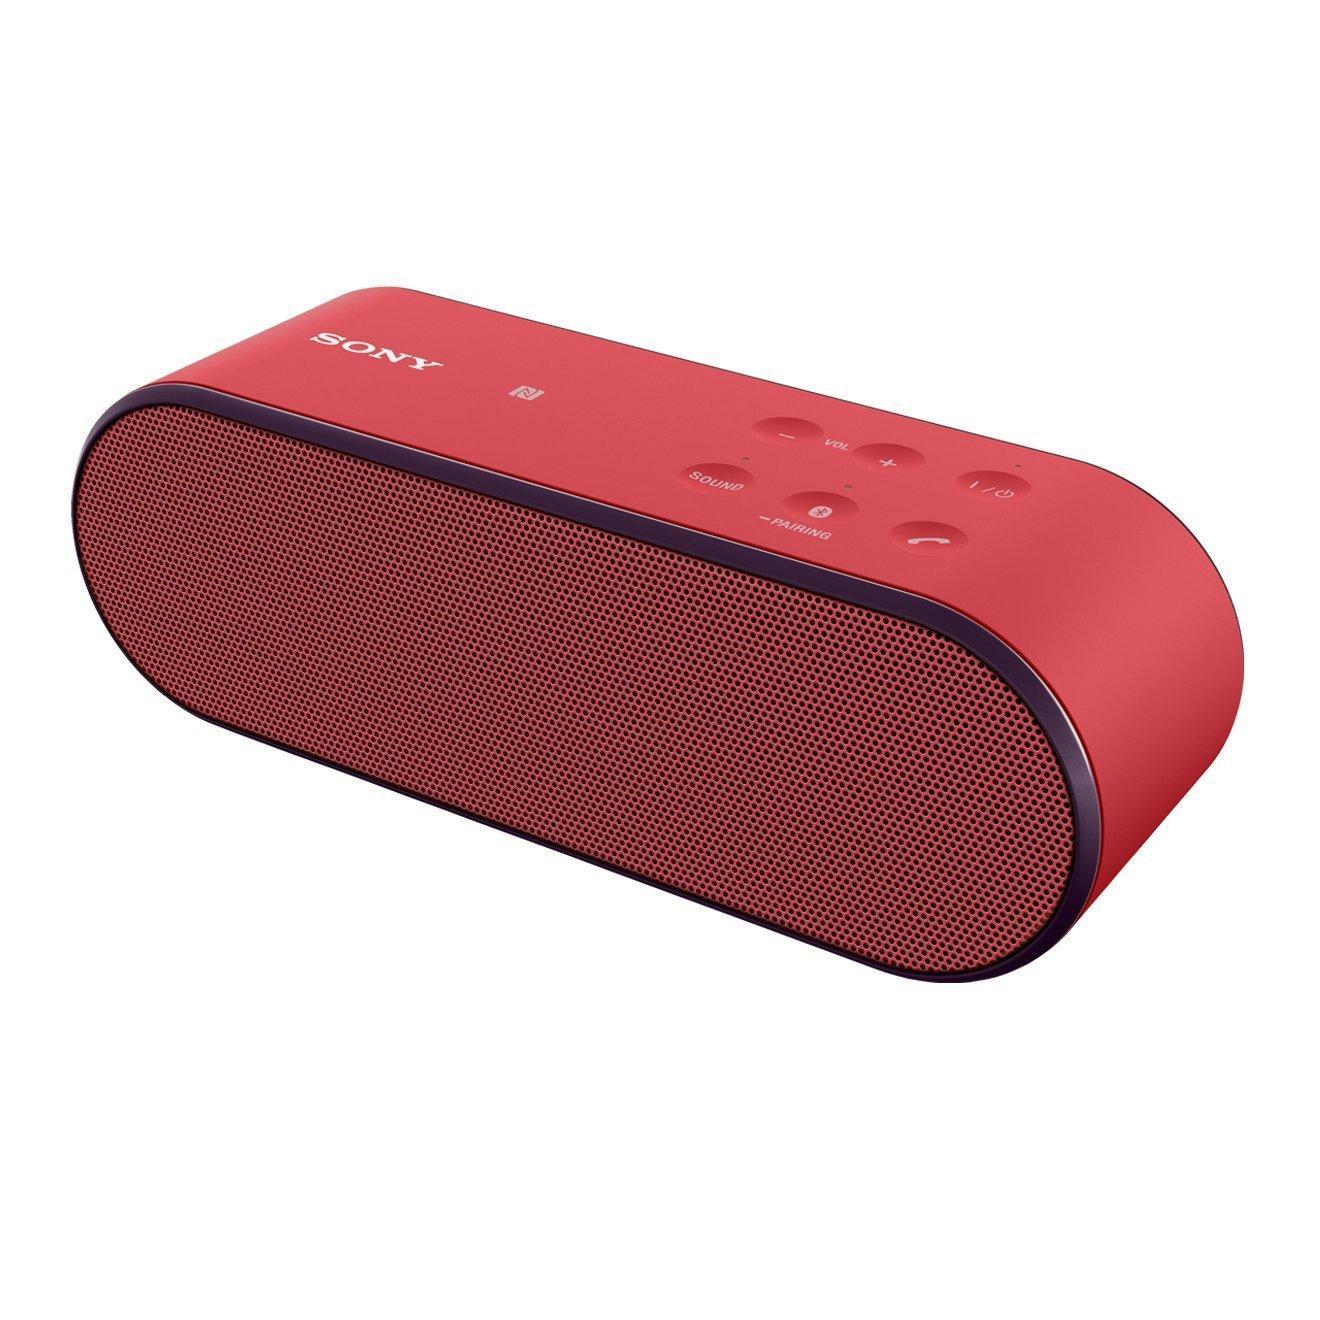 Enceinte bluetooth Sony SRS-X2 - 20 W, rouge